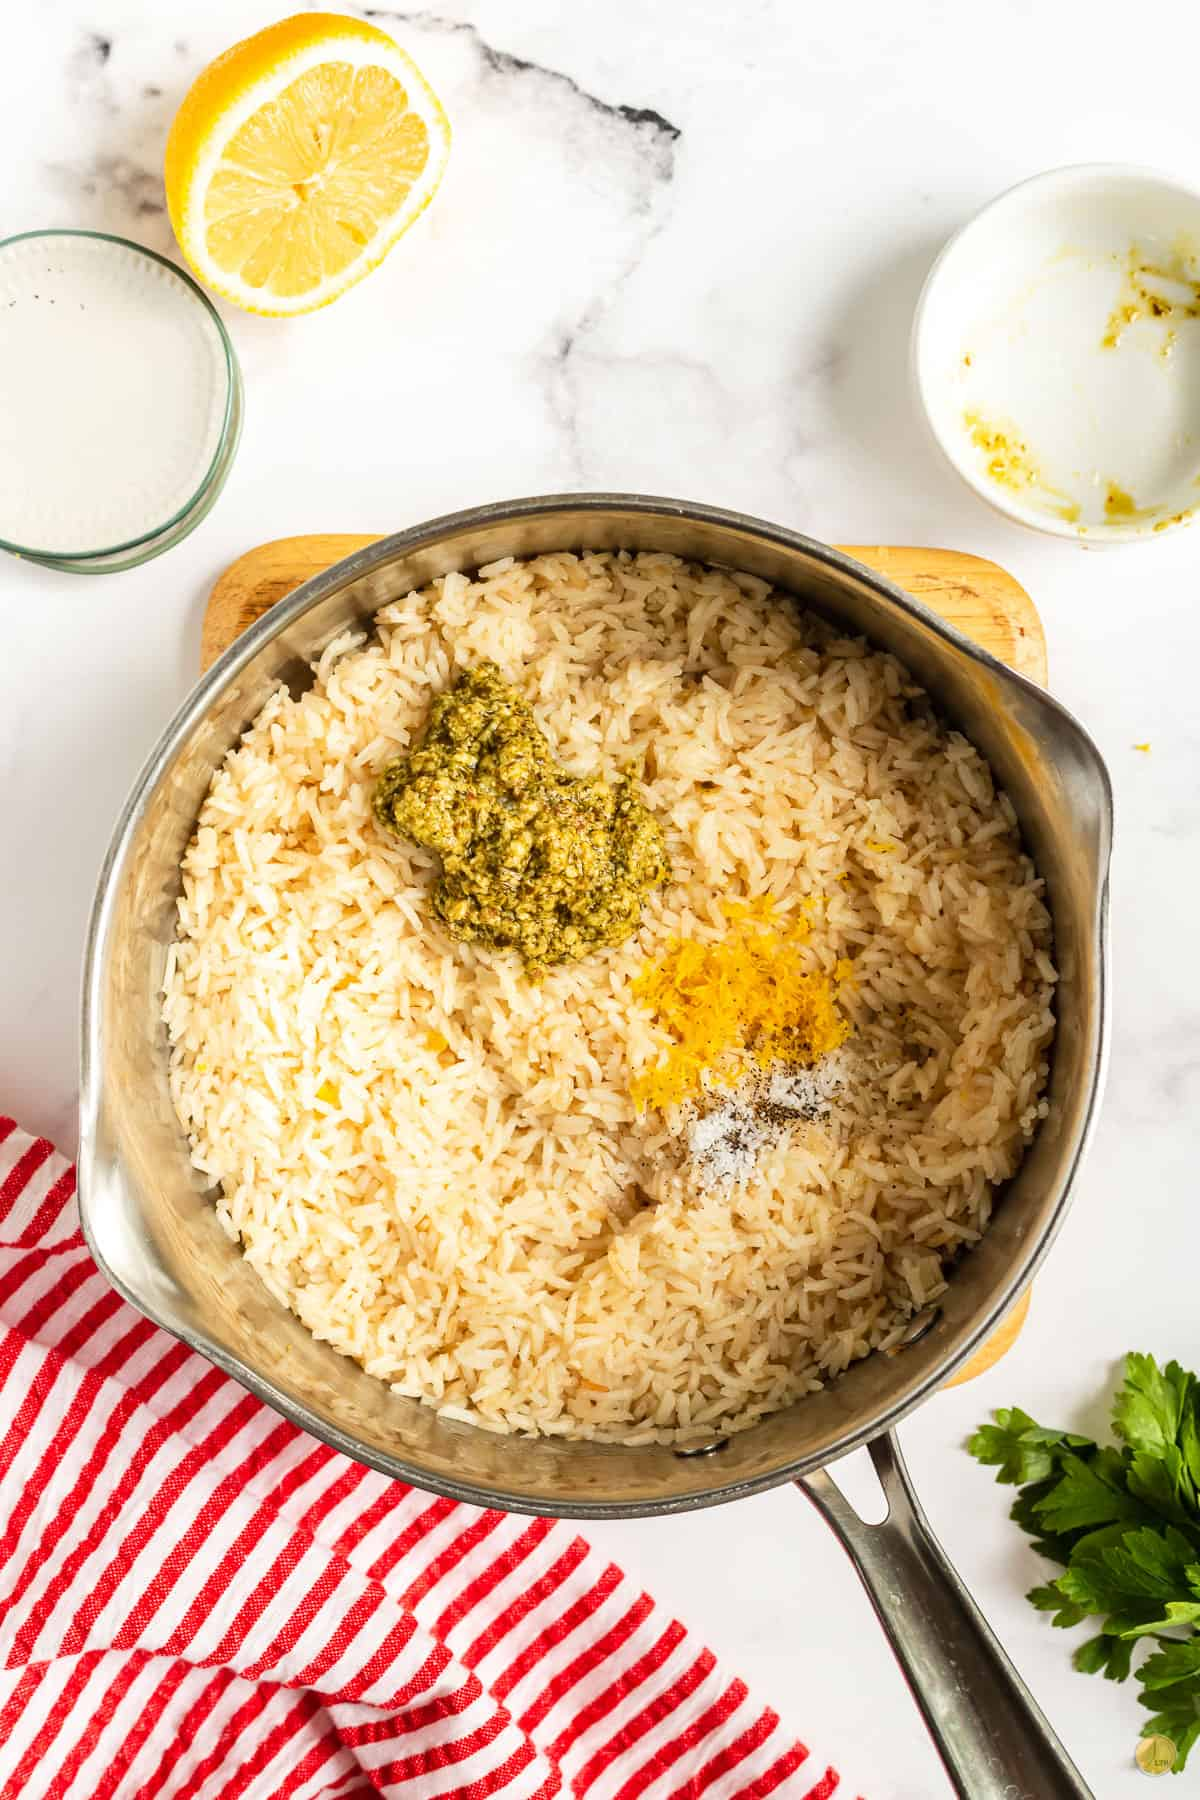 rice, pesto & lemon zest